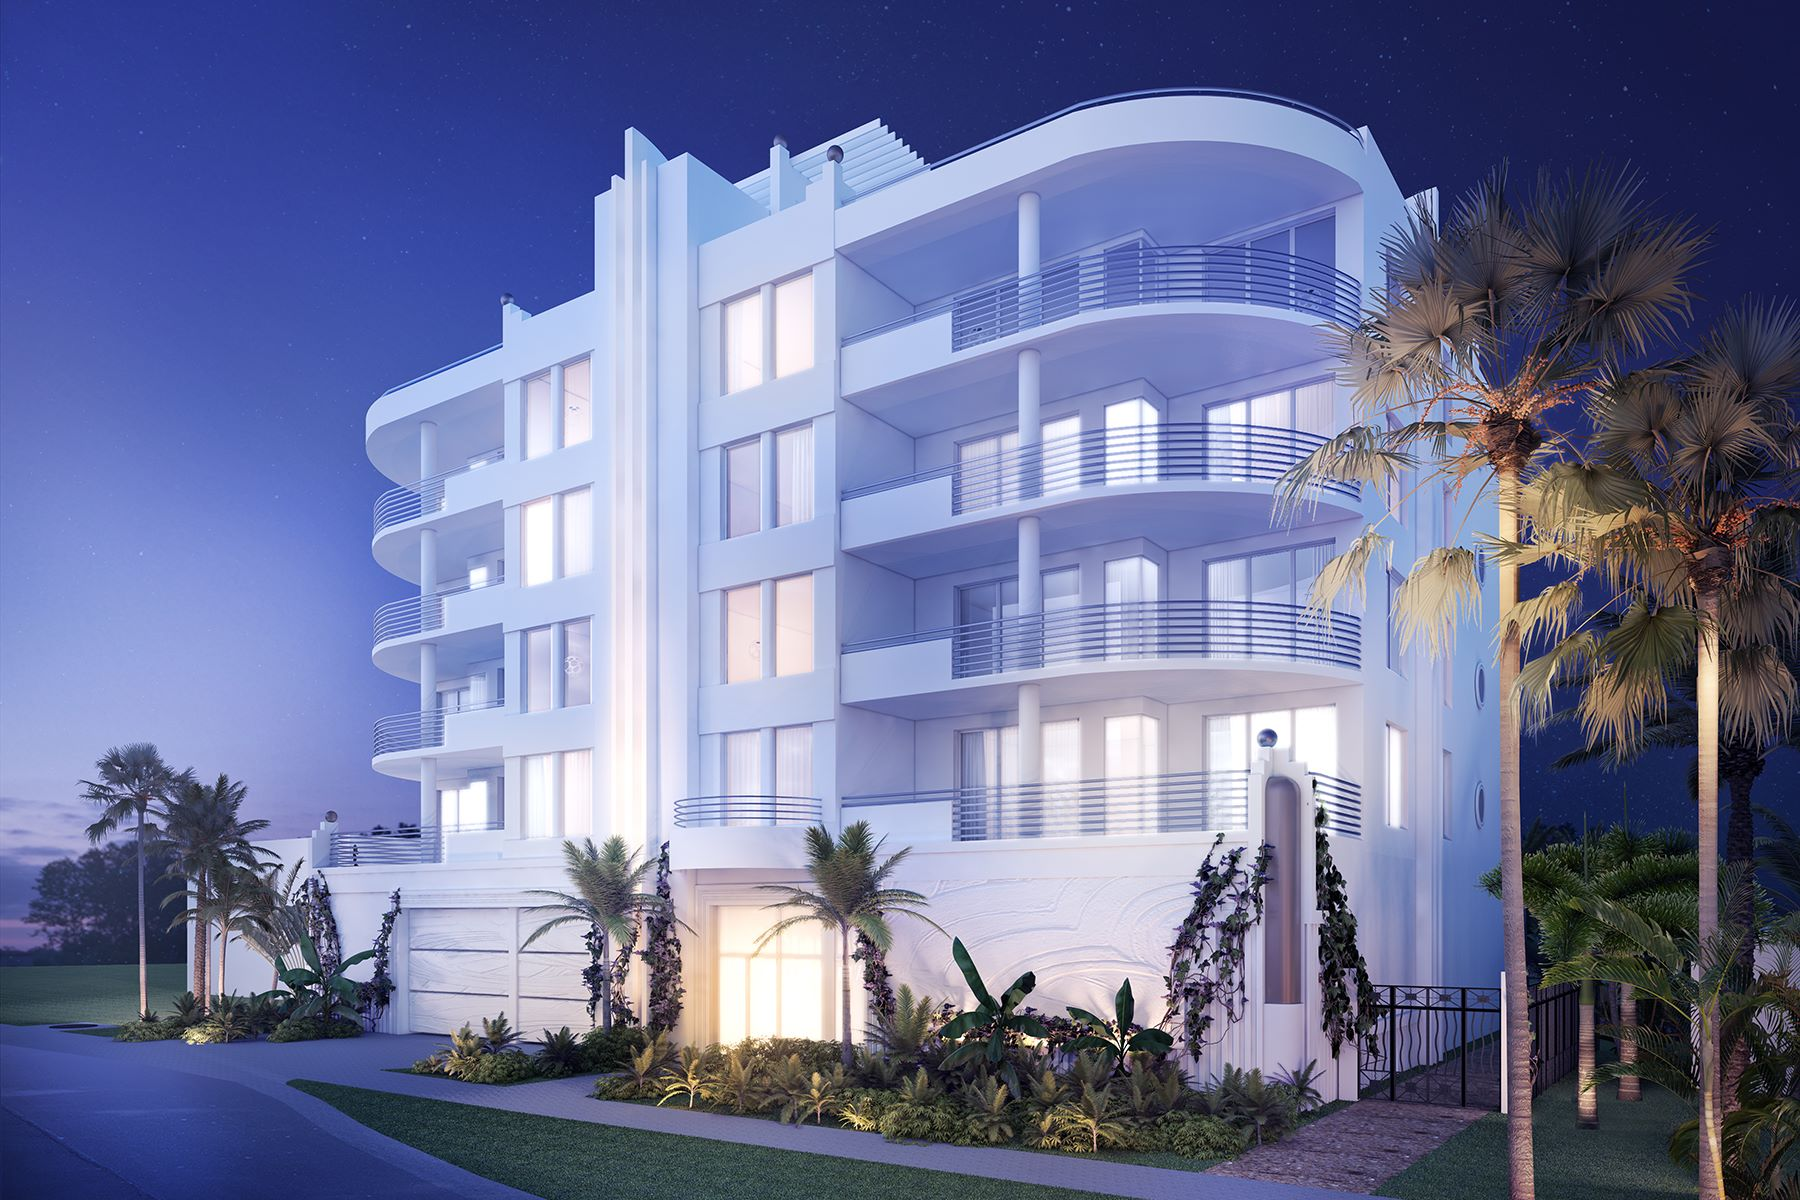 Condominium for Sale at 609 Golden Gate Pt , South 201, Sarasota, FL 34236 609 Golden Gate Pt South 201, Sarasota, Florida 34236 United States